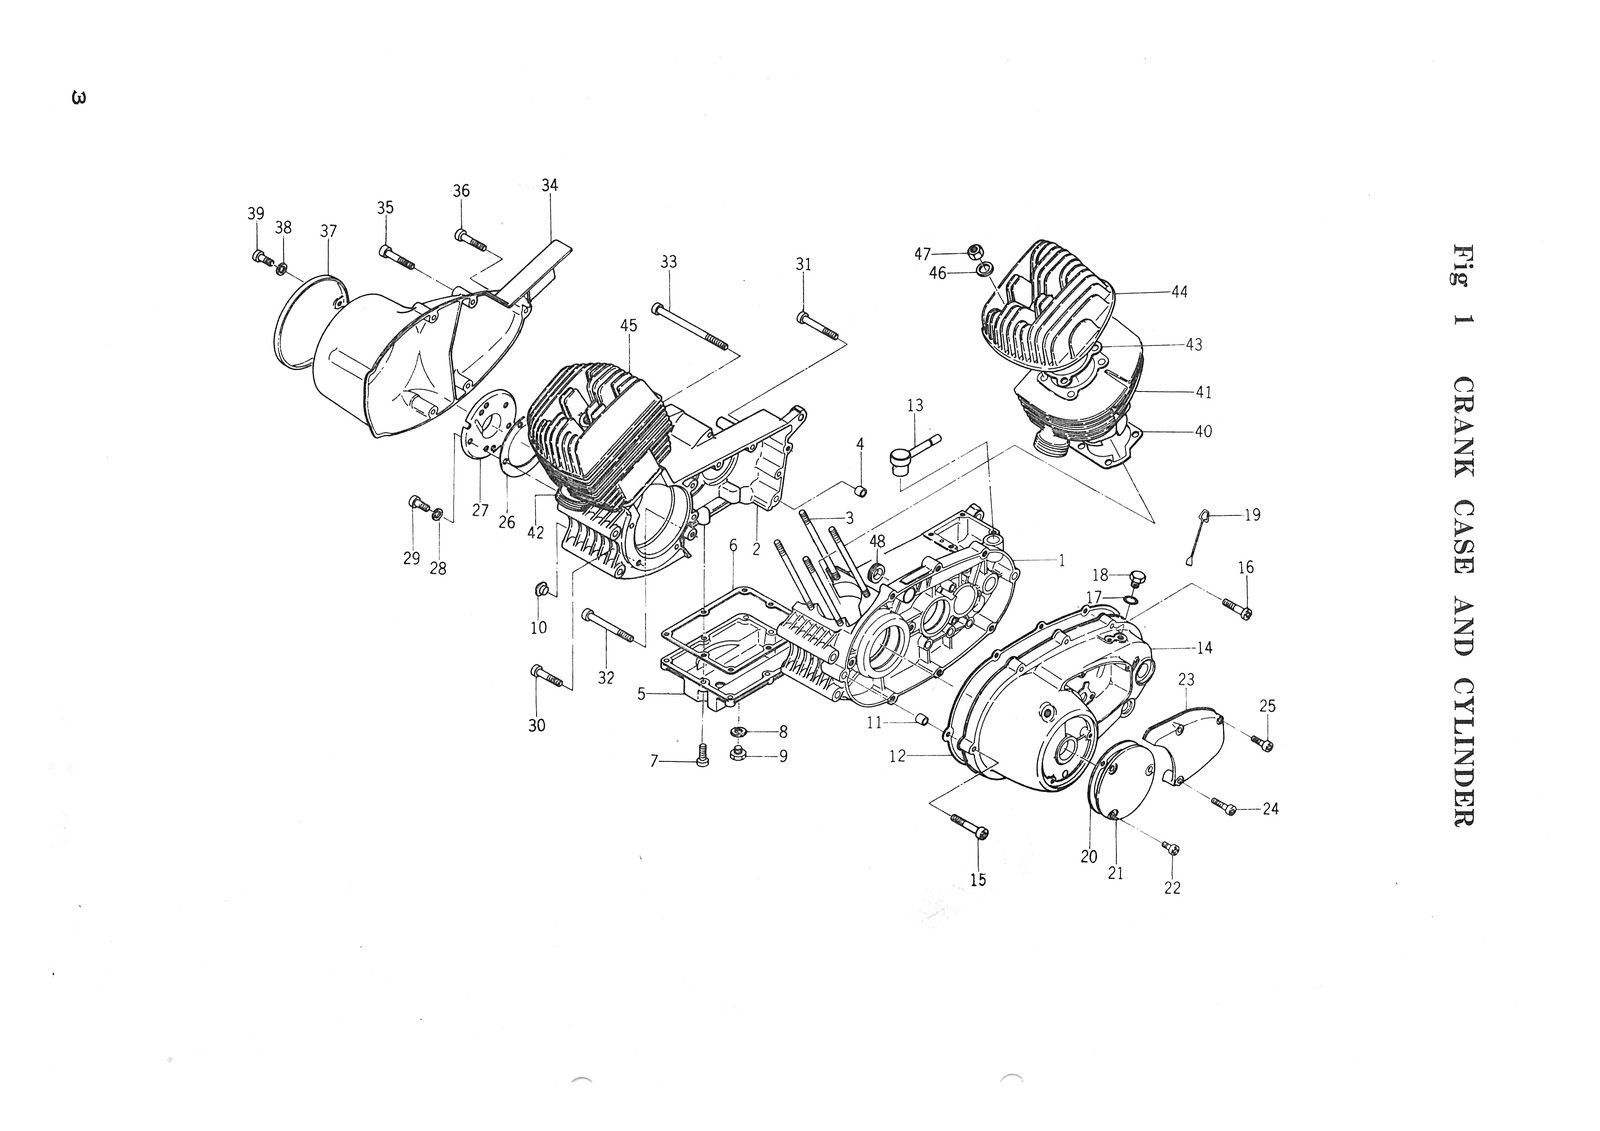 small resolution of yamaha parts manual yds3 yds3c yds3 c 1964 1965 1966 spares catalog list ebay